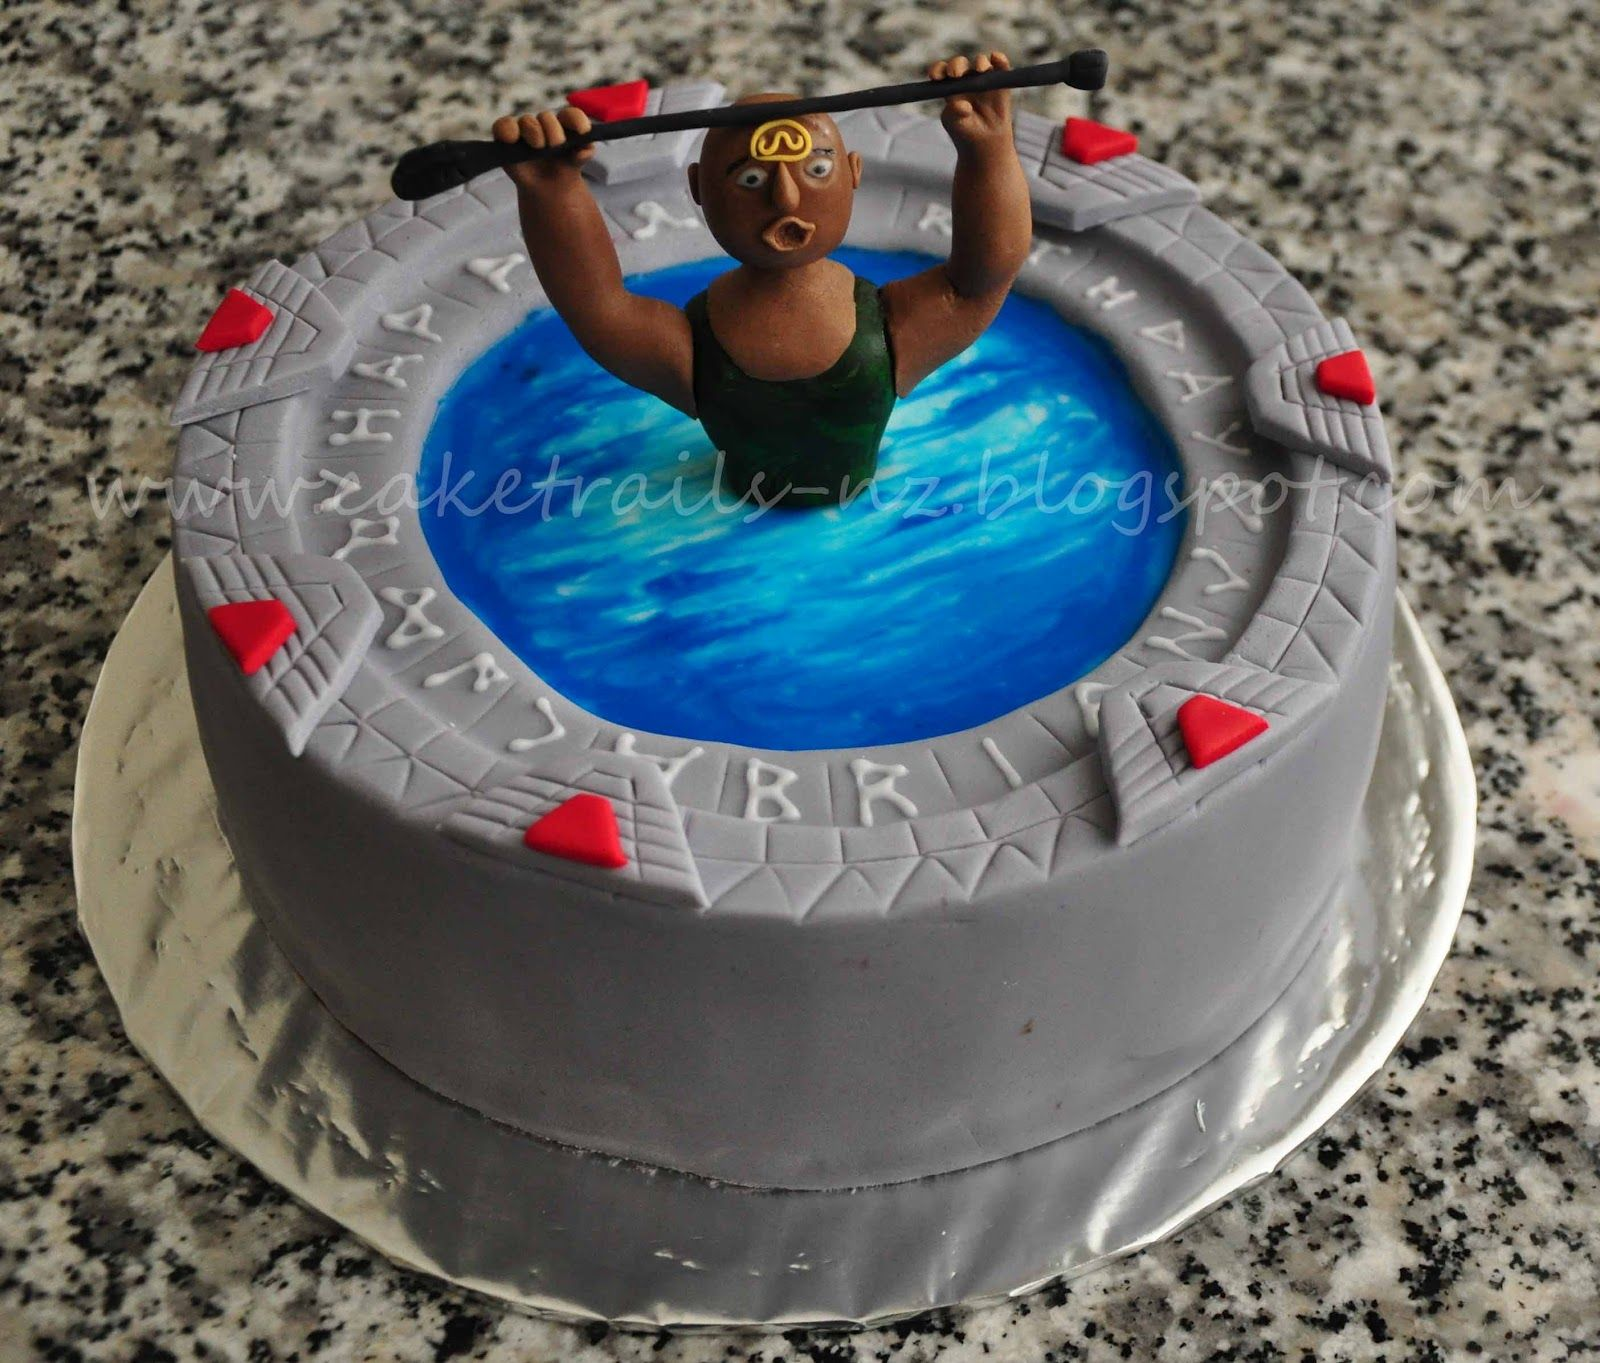 Cake Trails: Stargate cake